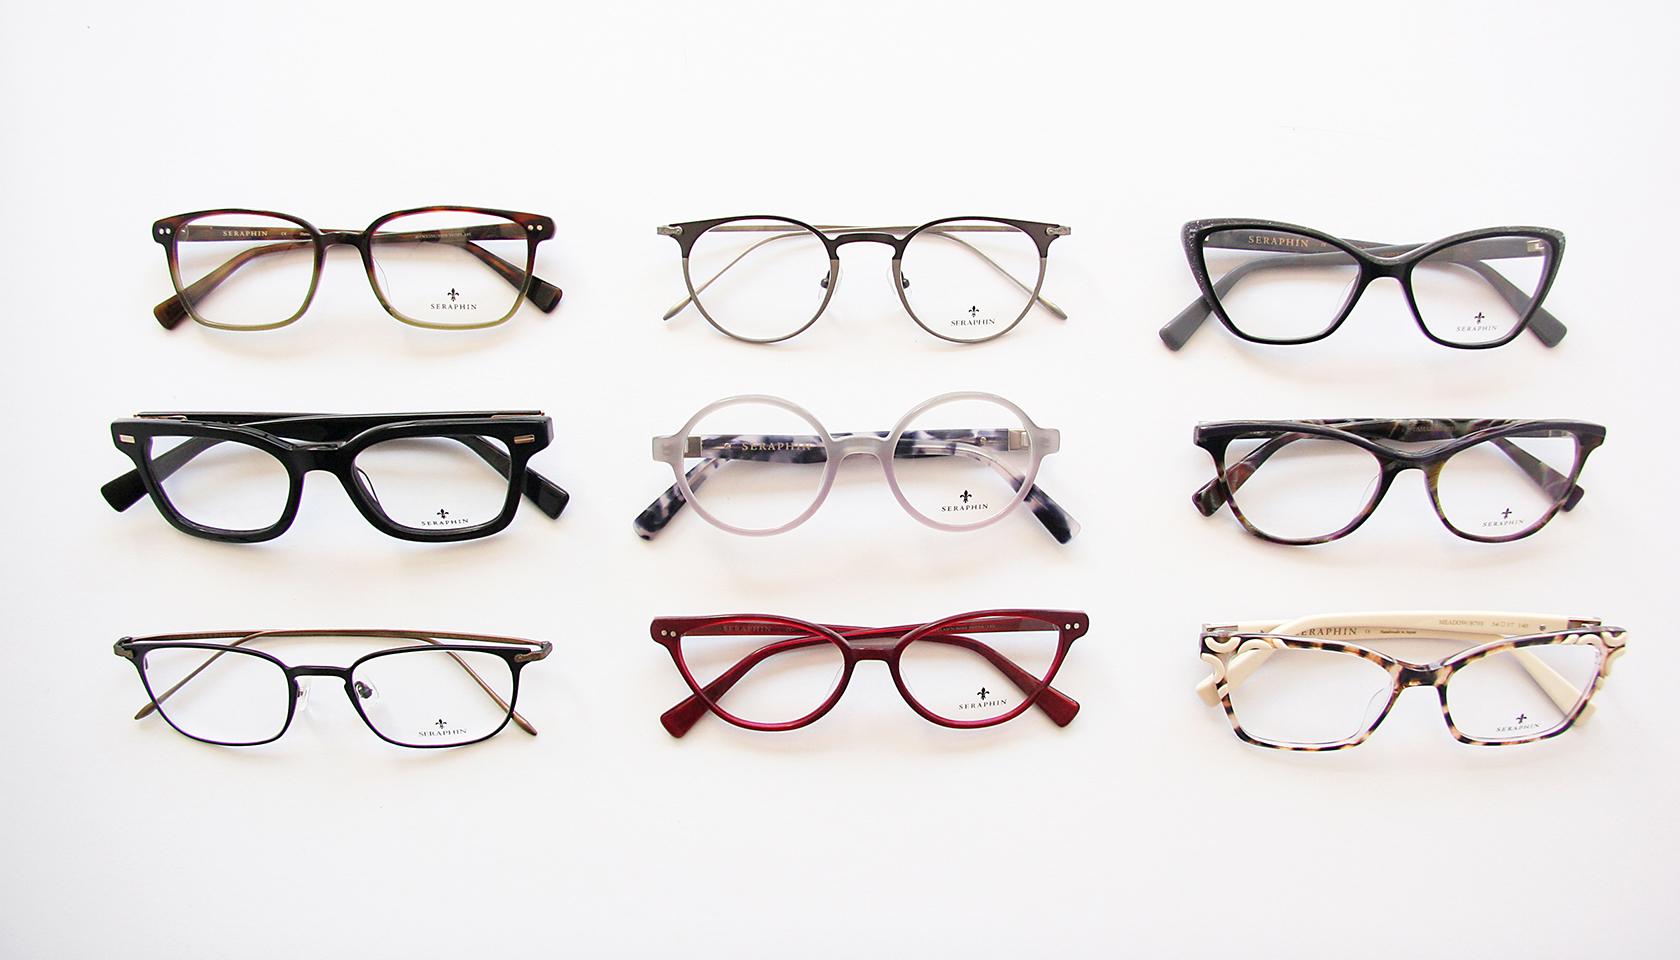 Seraphin Eyeglasses at Hillcrest Optical